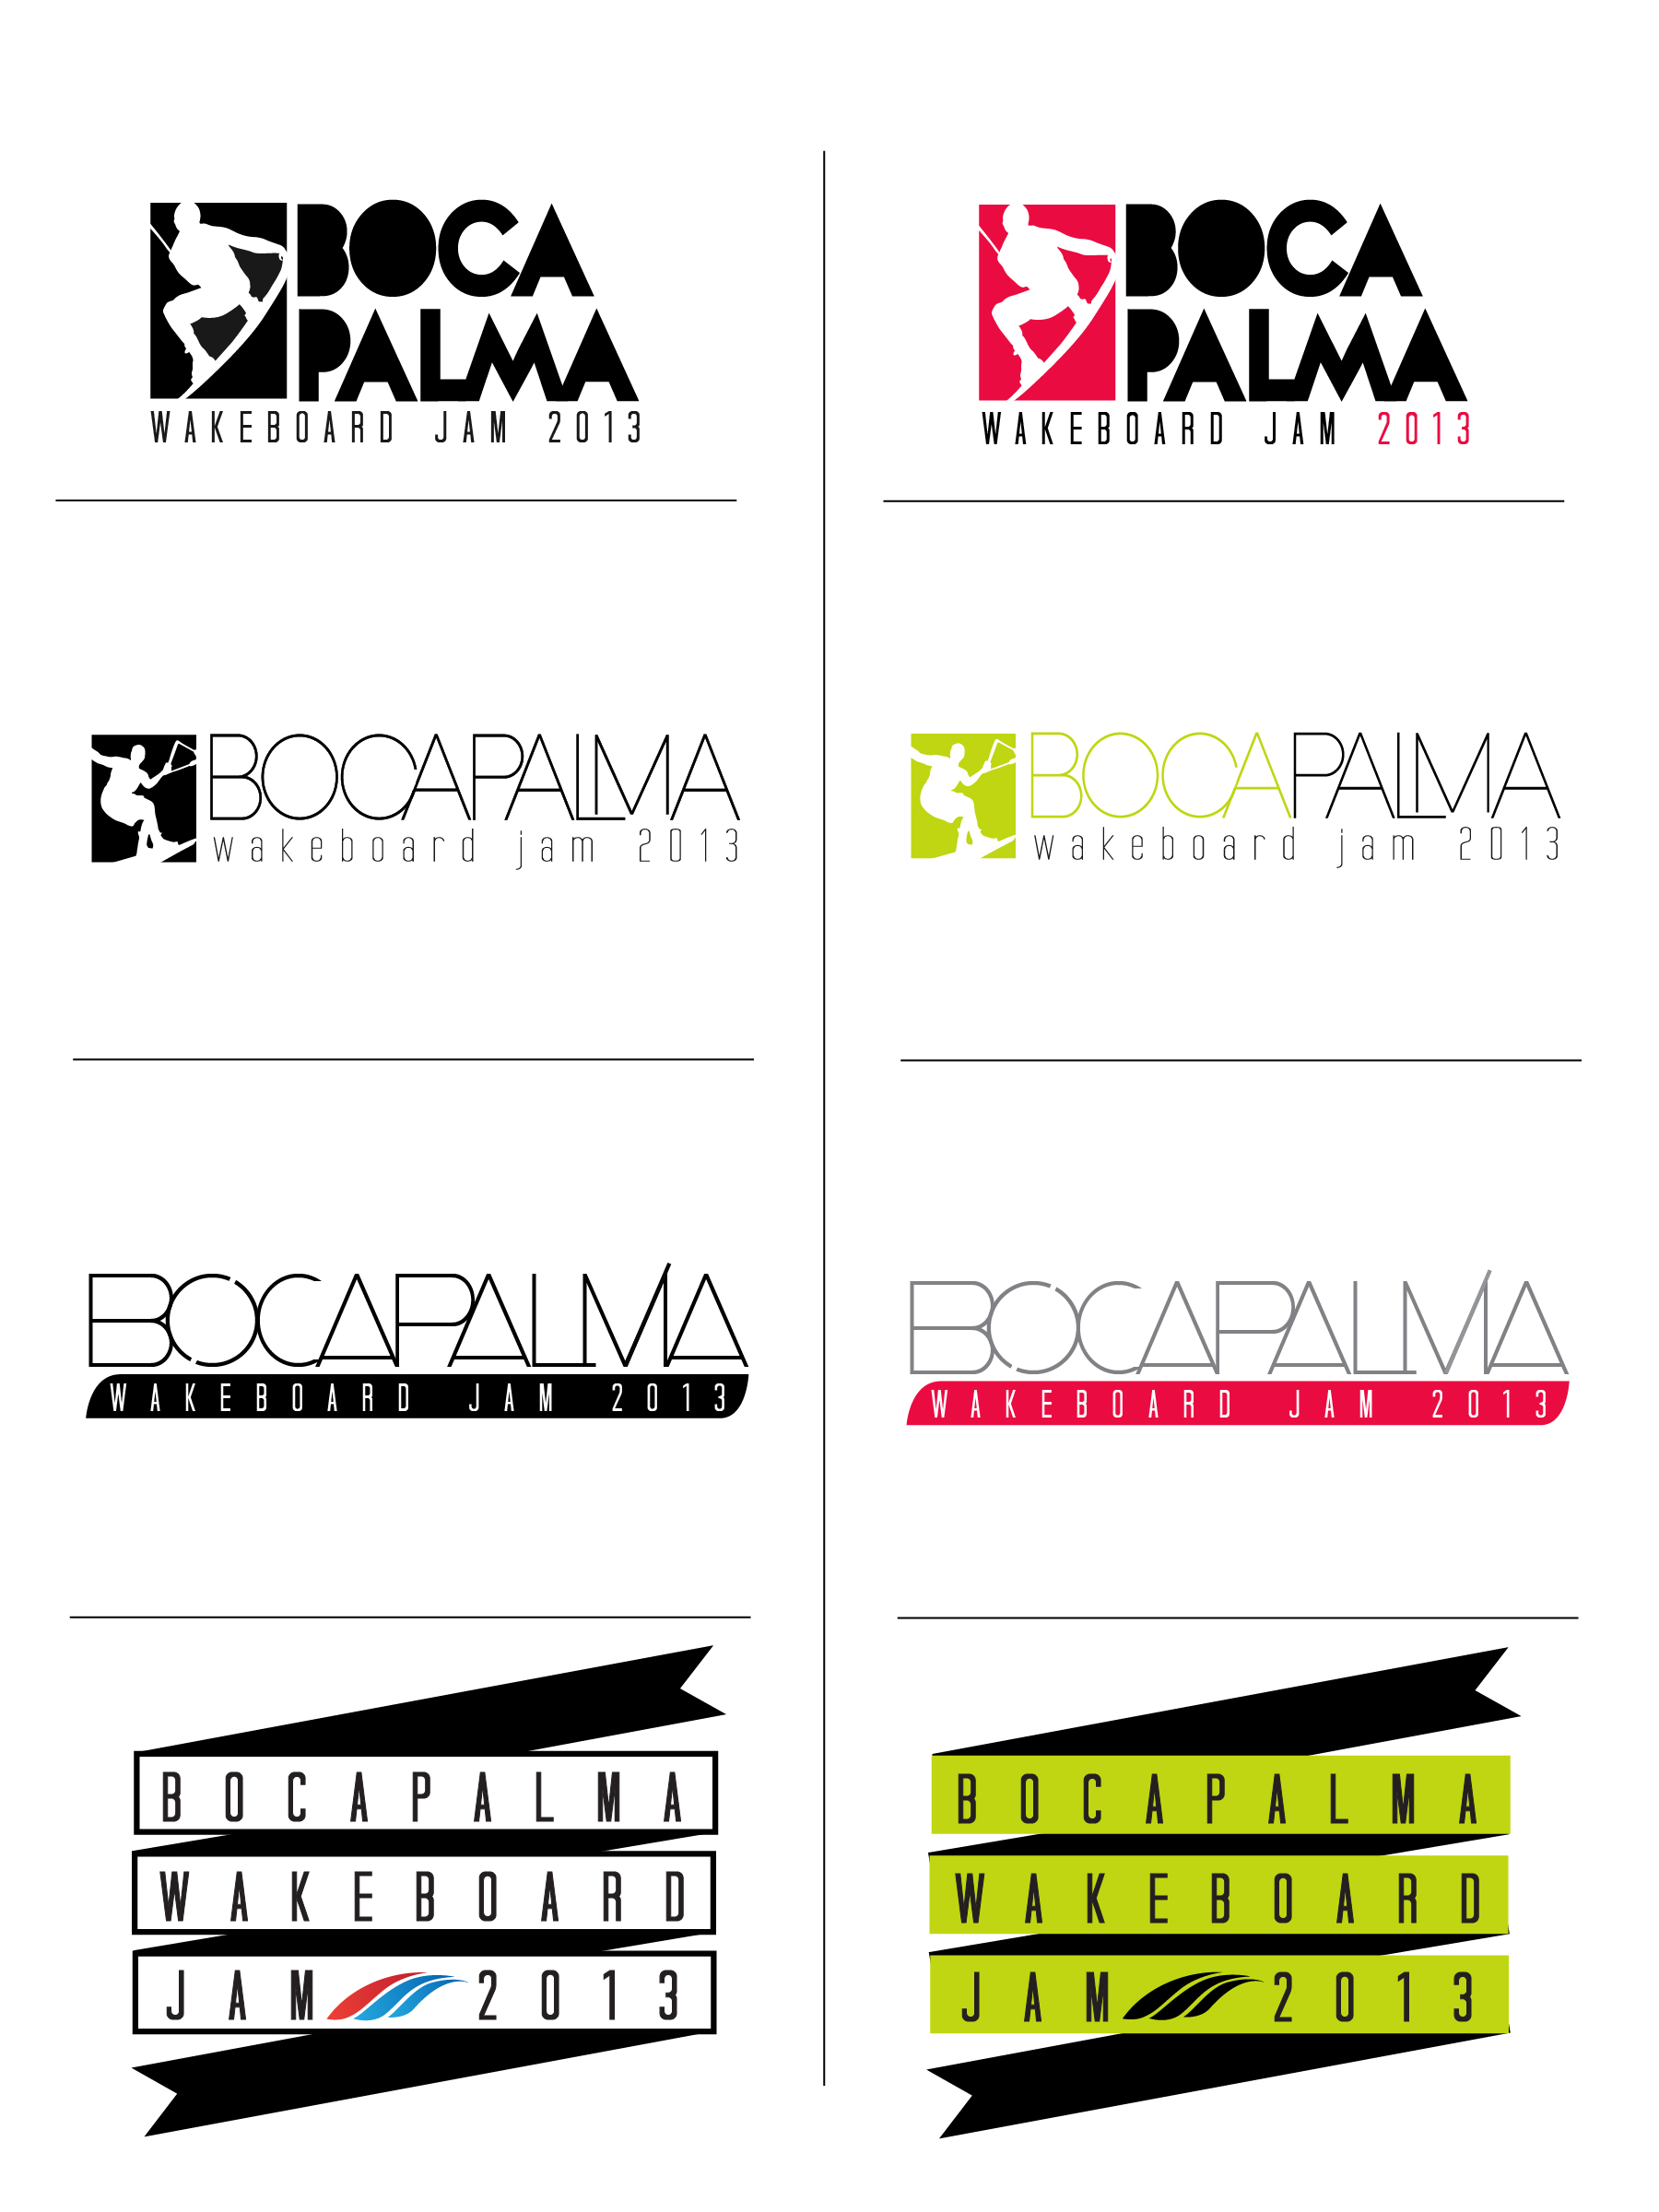 bocapalma wakeboard jam 2013-02